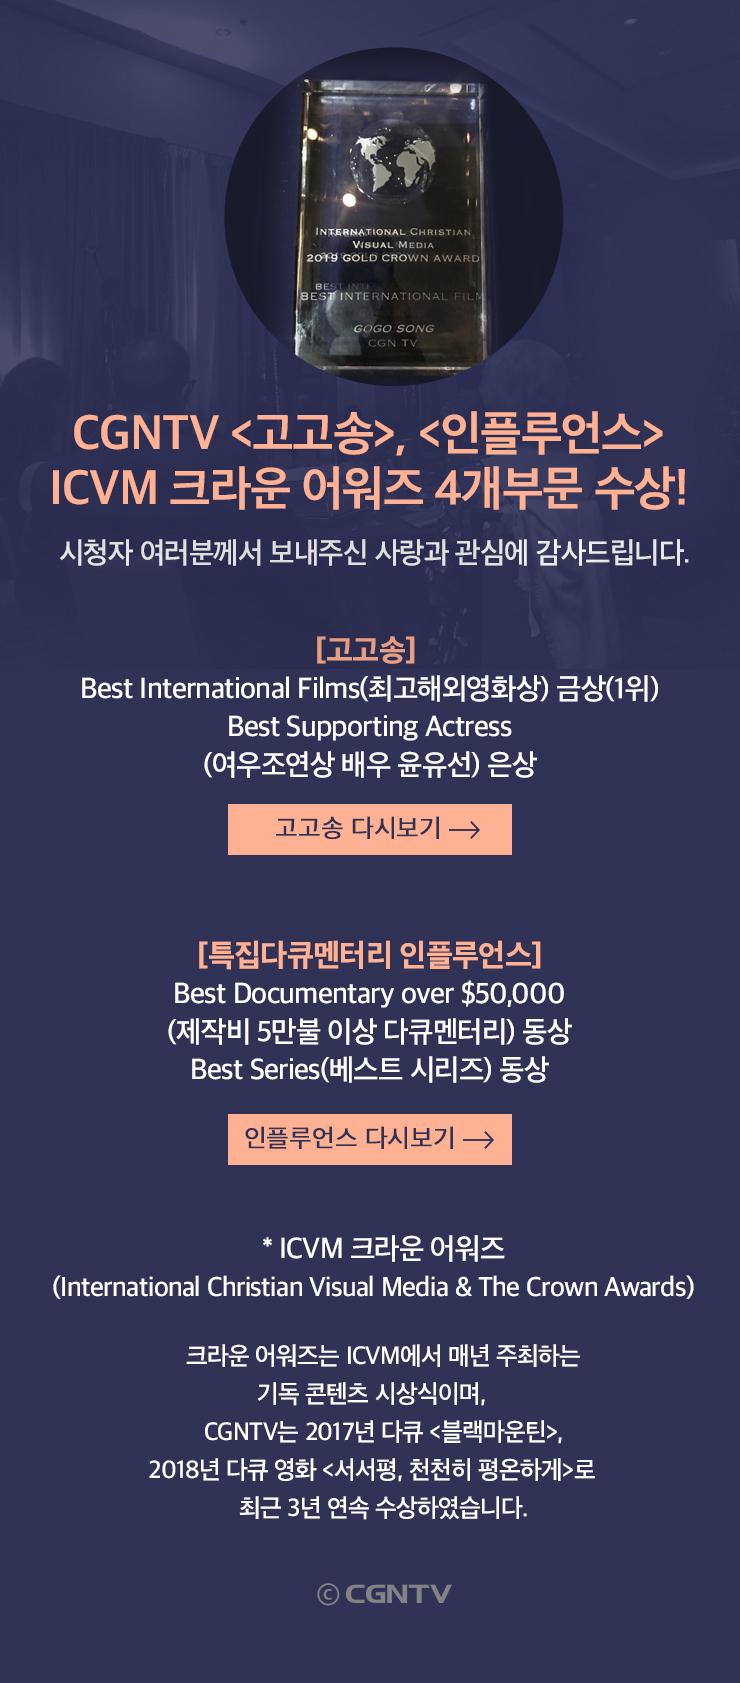 CGNTV <고고송>, <인플루언스> ICVM 크라운 어워즈 4개부문 수상! 시청자 여러분께서 보내주신 사랑과 관심에 감사드립니다.